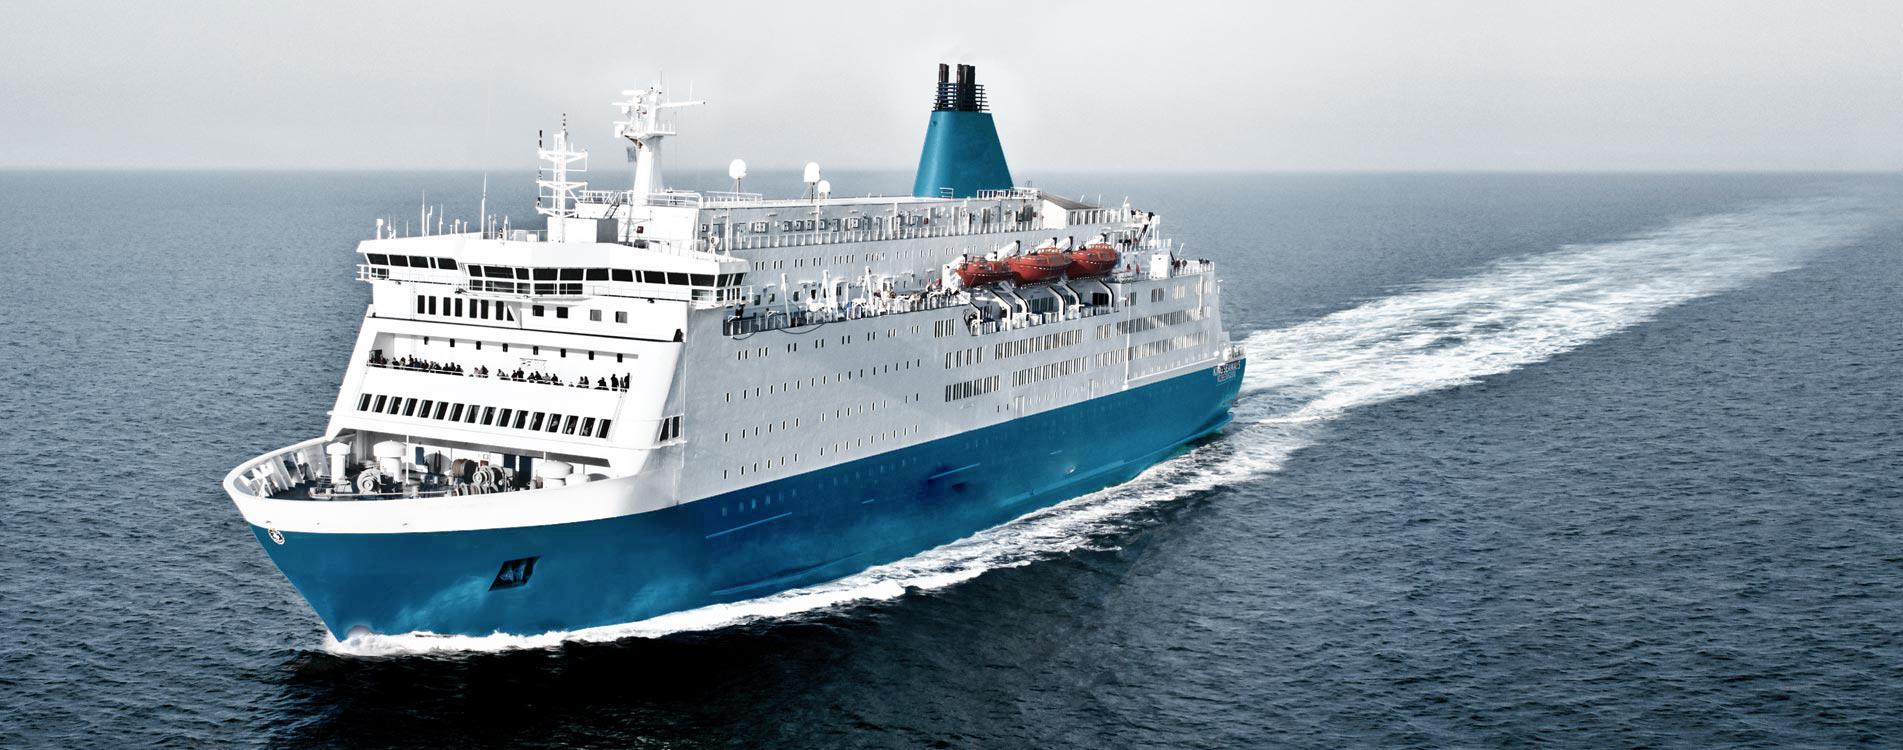 Finnlines Geplande Werkzaamheden Naantali – Kapellskar